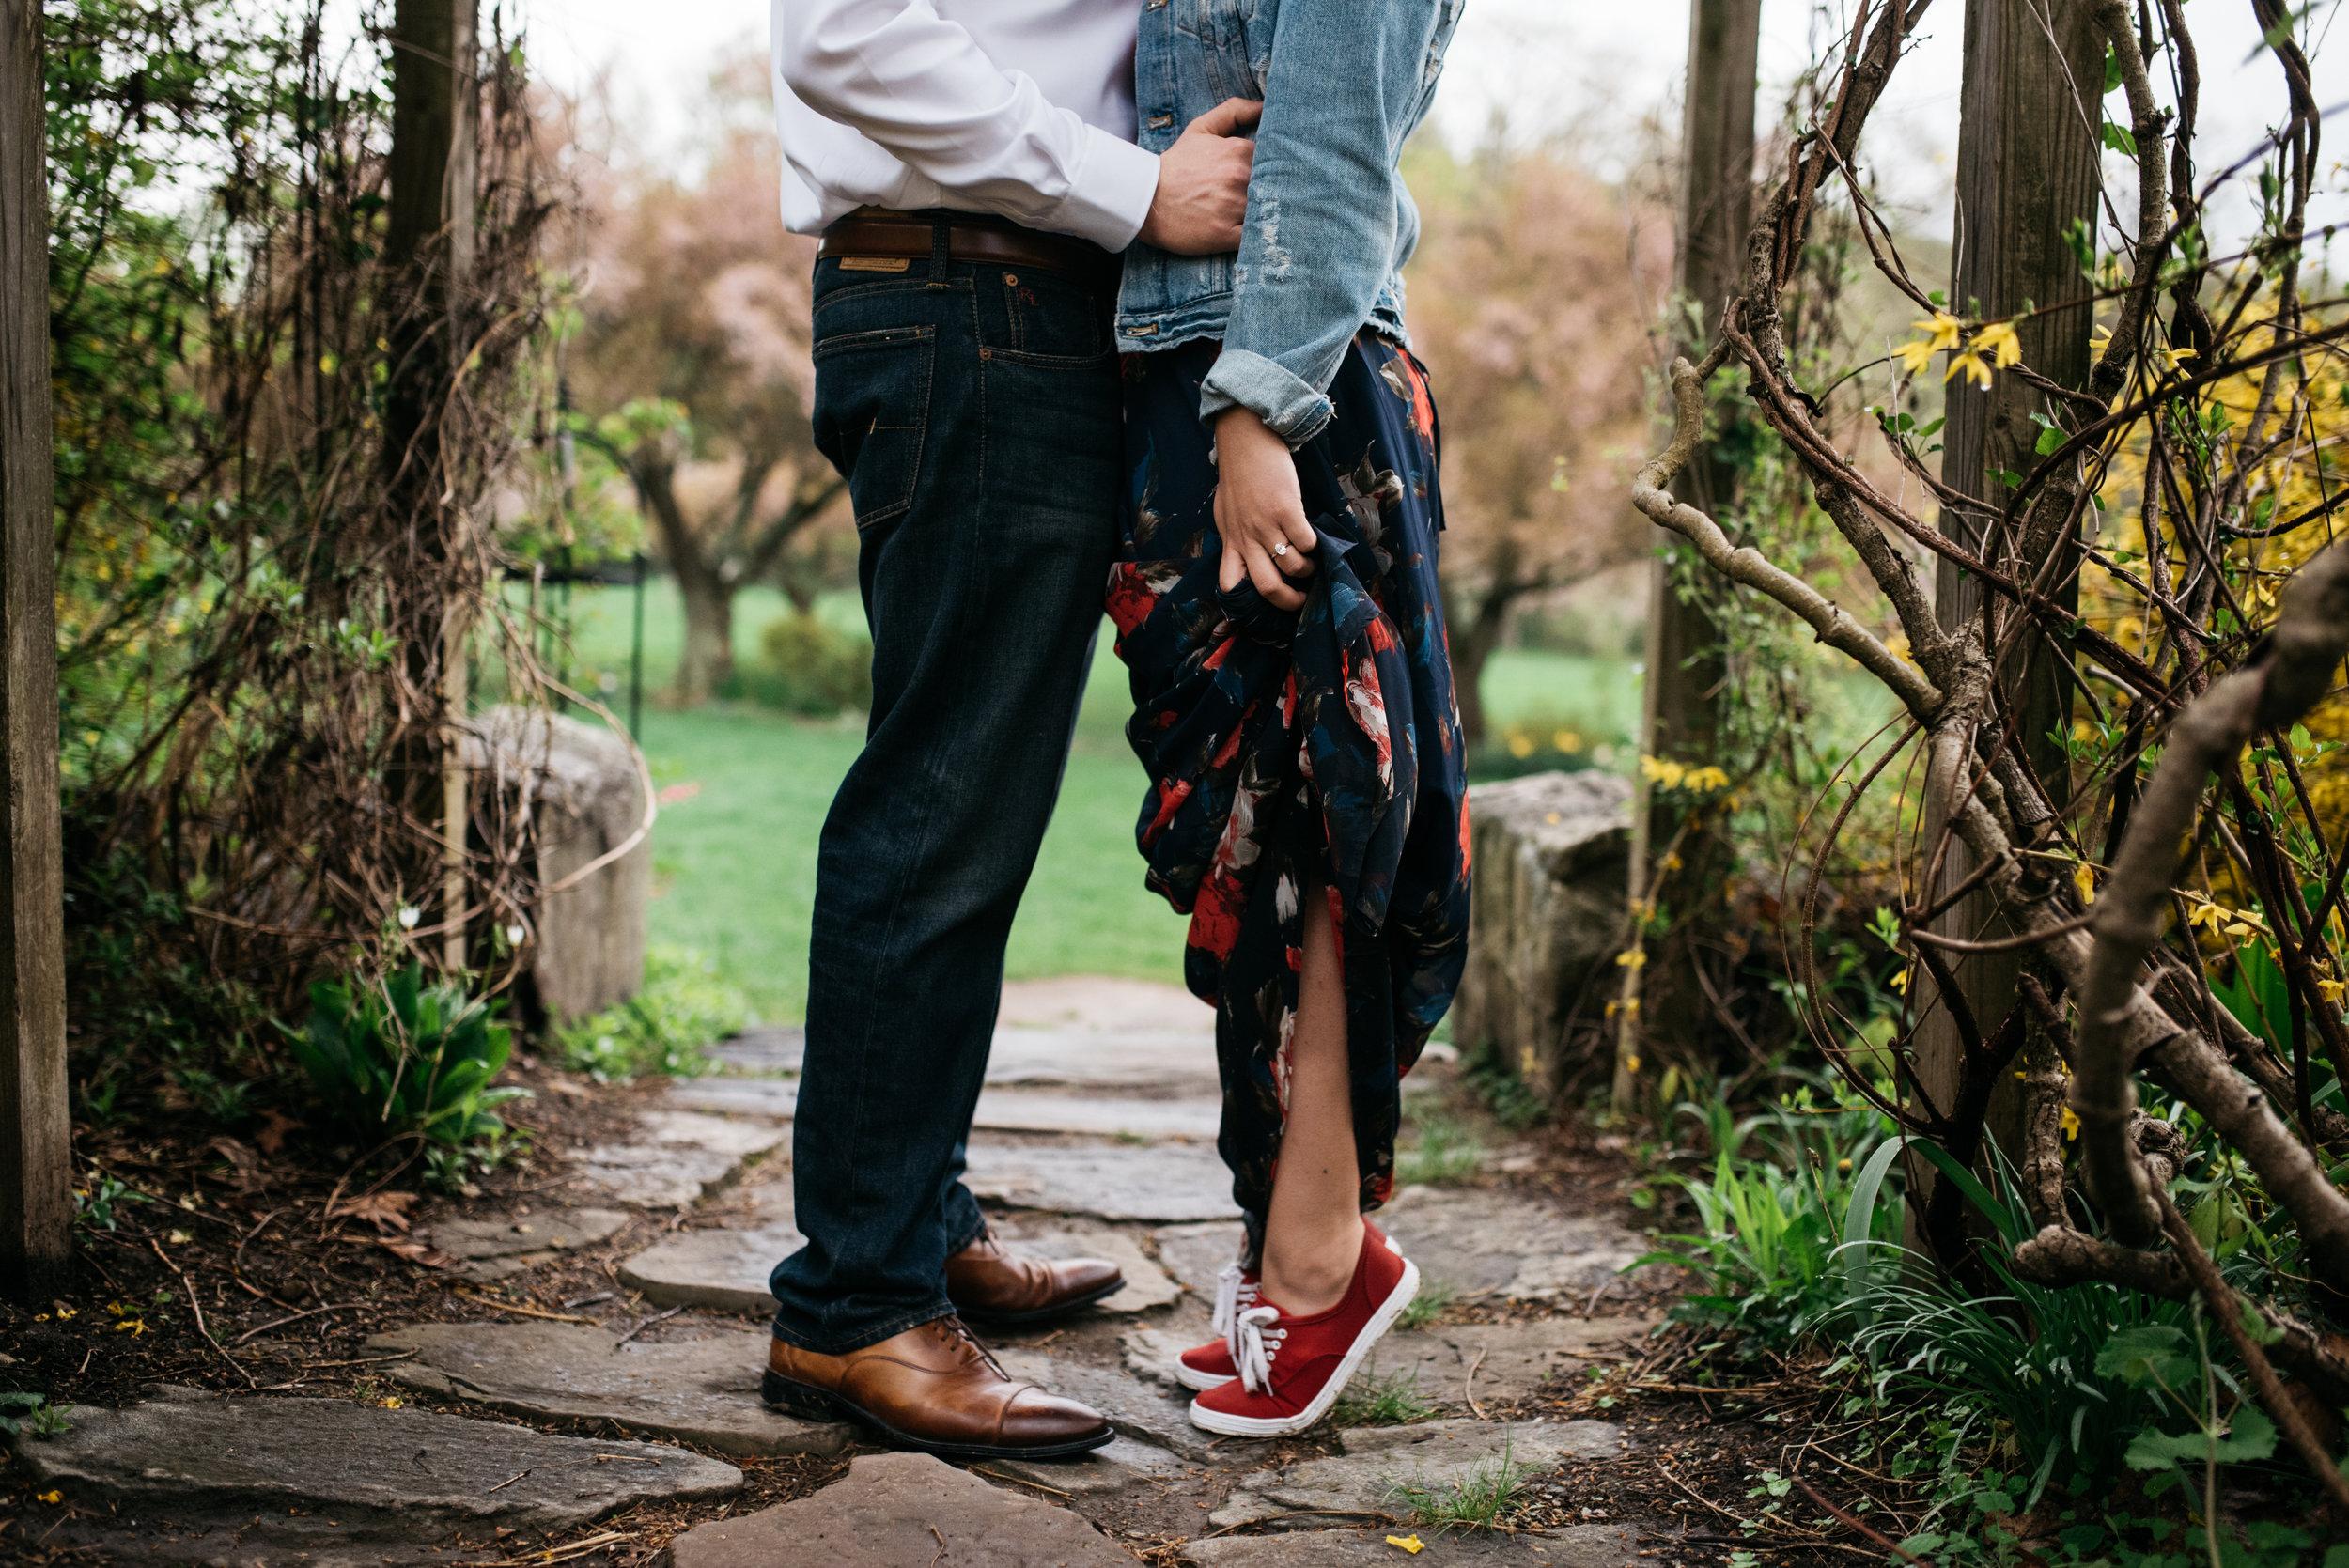 WeddingPhotos | NJPhotographer | Highlights-3.jpg